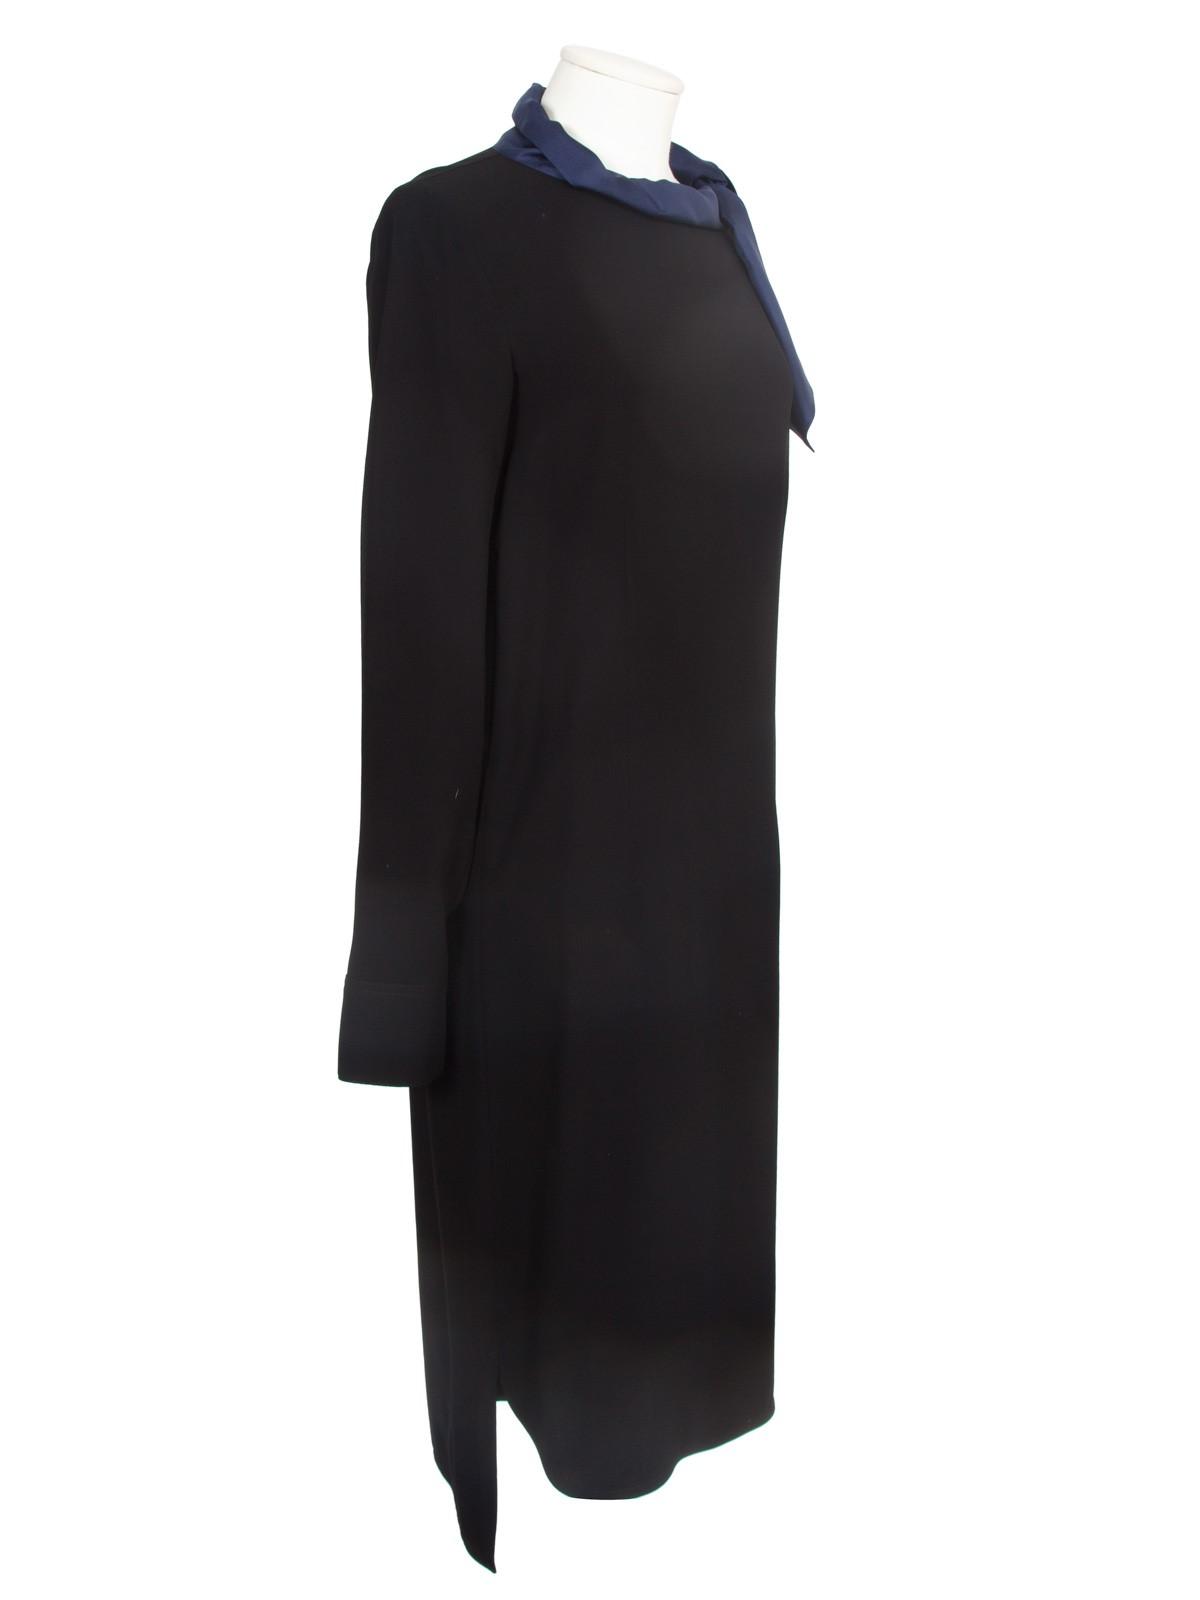 52e85bdda801 marni SCARF TIE SHIFT DRESS available on montiboutique.com - 20681